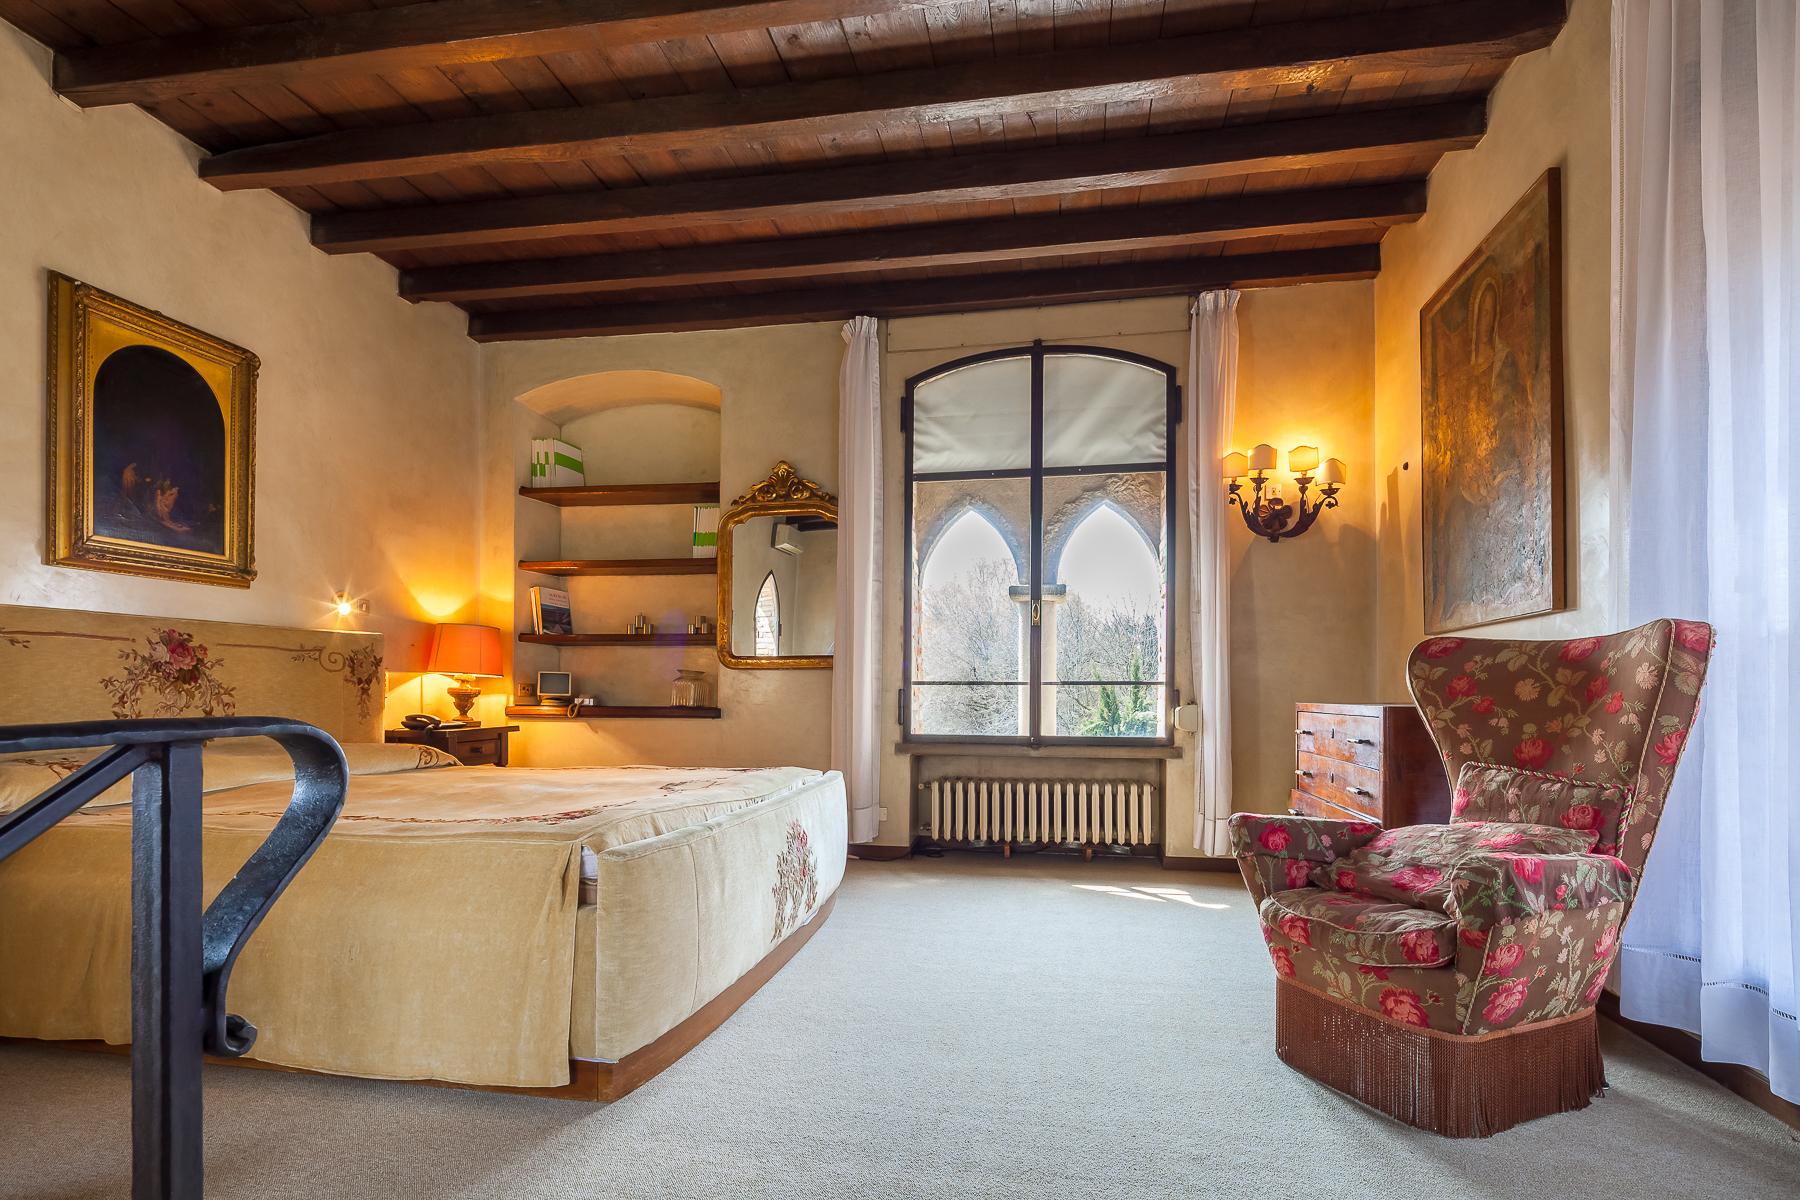 Villa in Vendita a Gorle: 5 locali, 850 mq - Foto 13